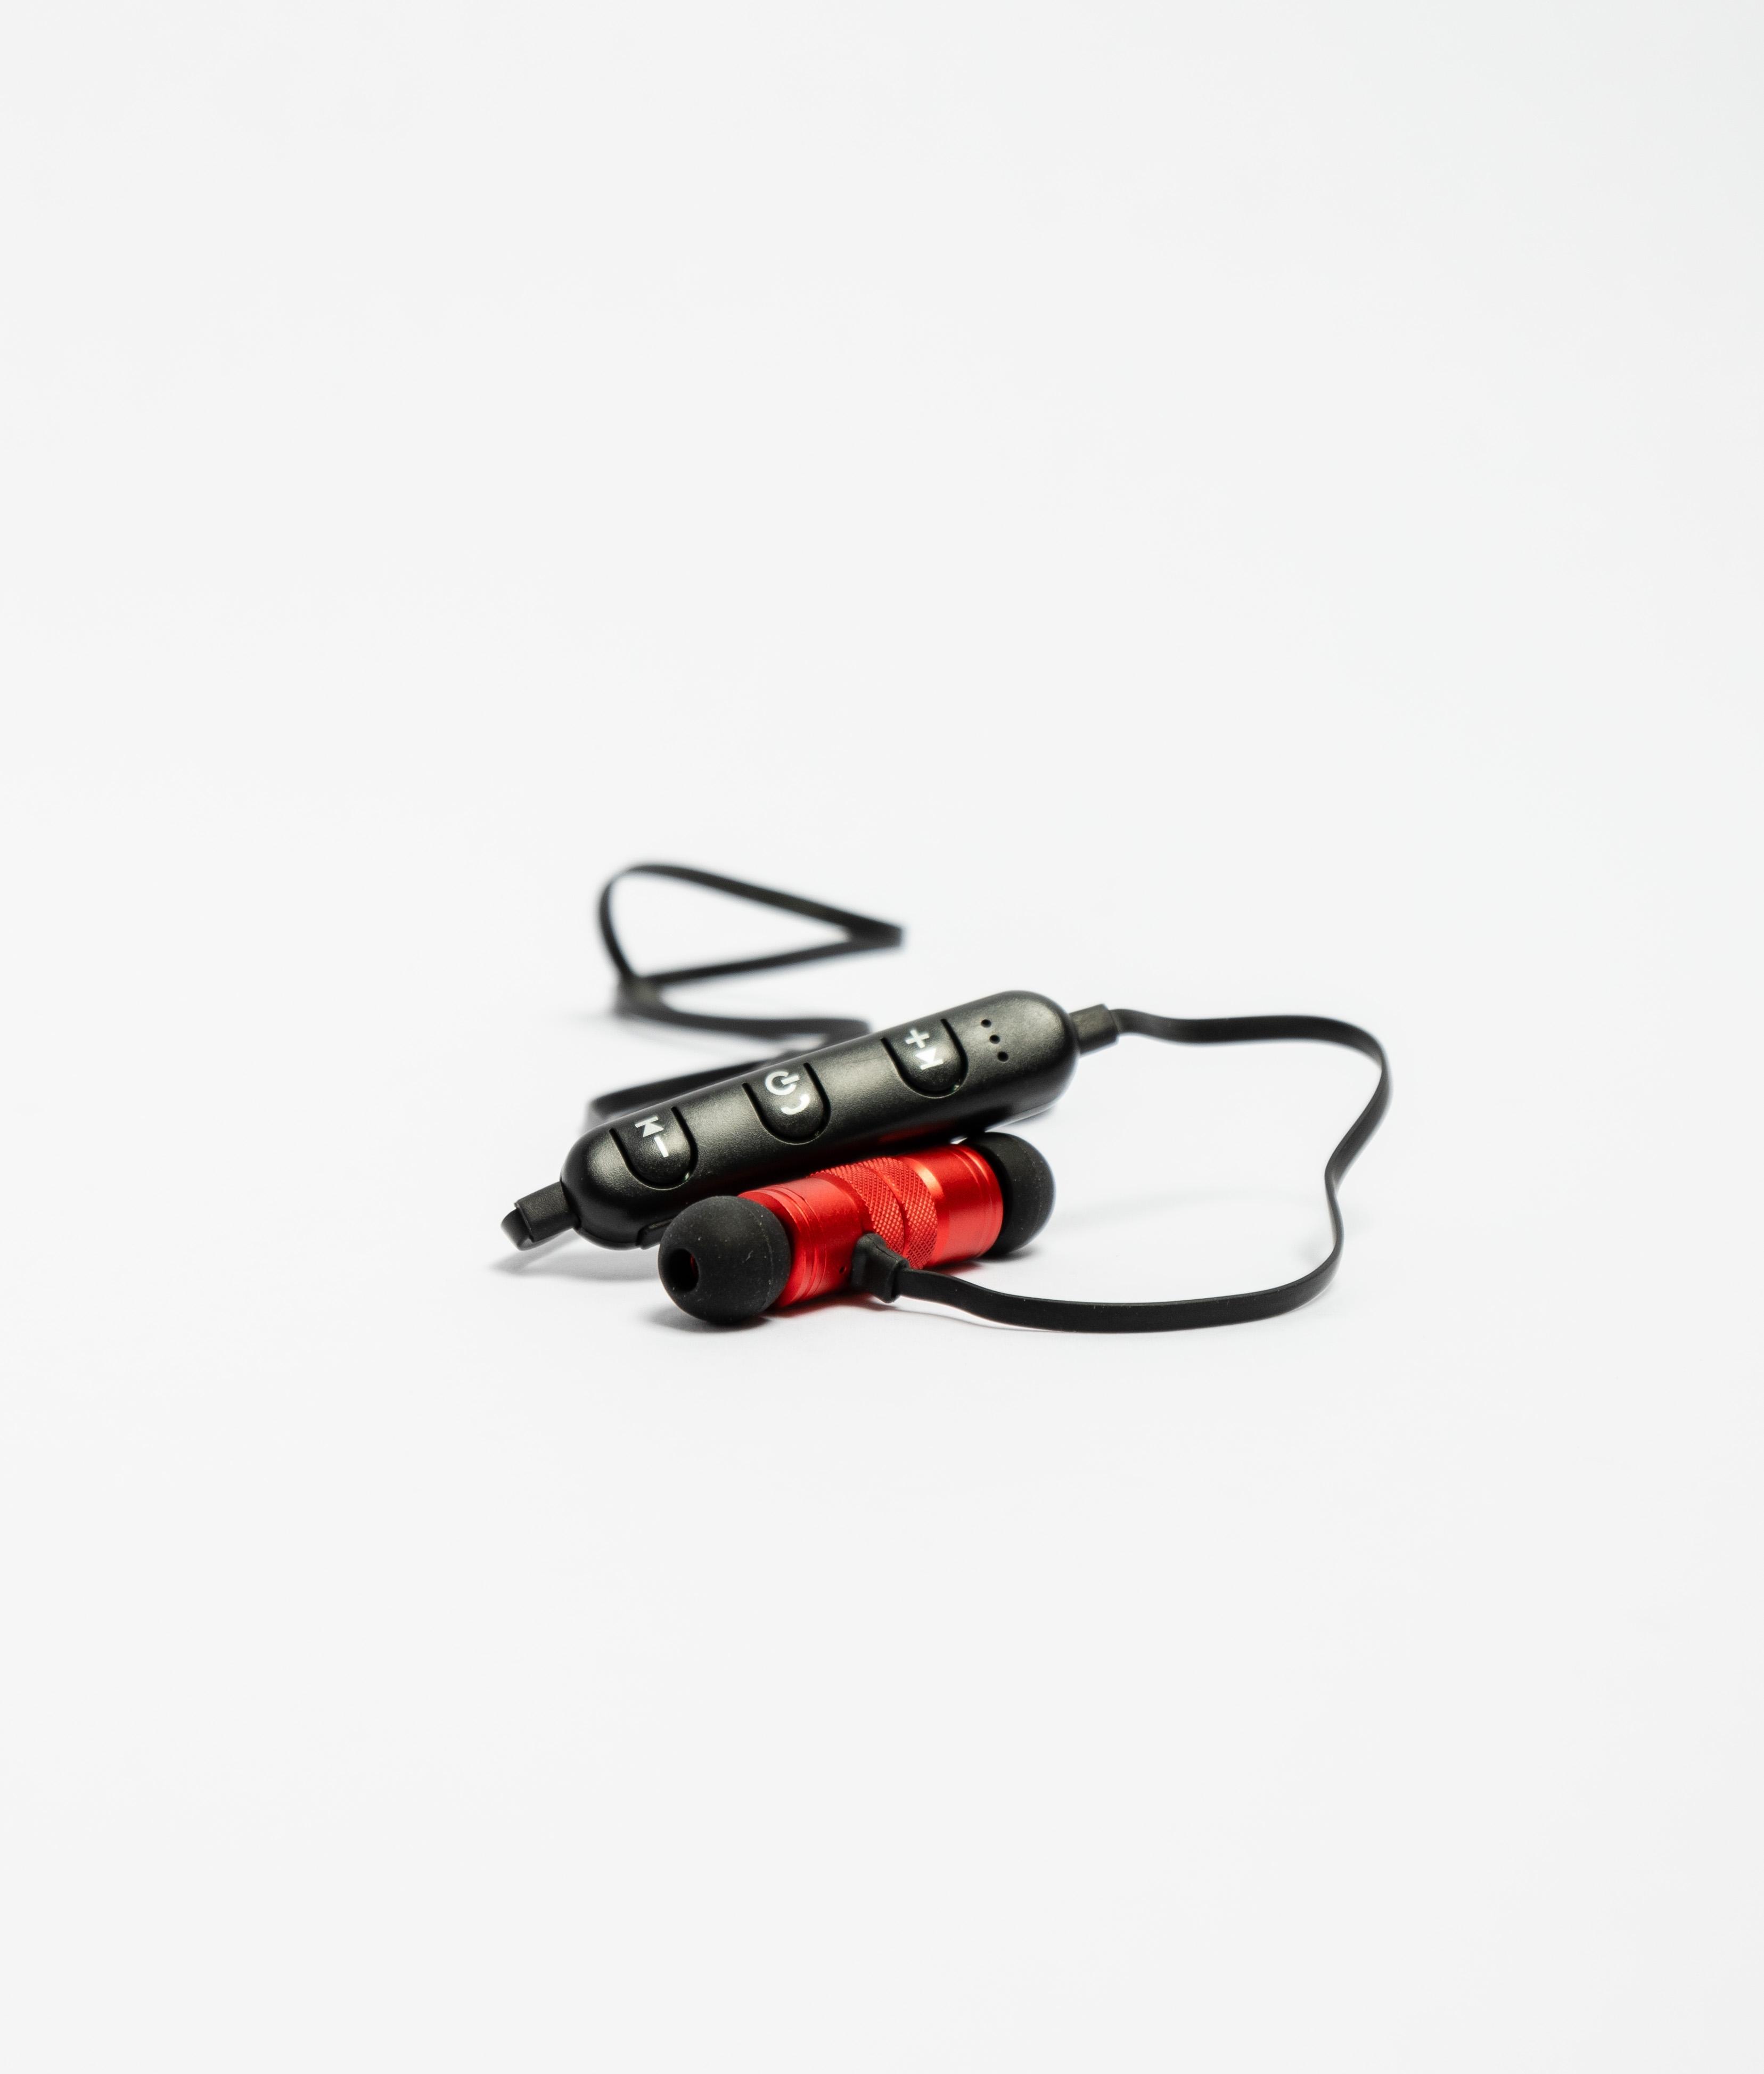 Auriculares Inalámbricos Flume - Rojo